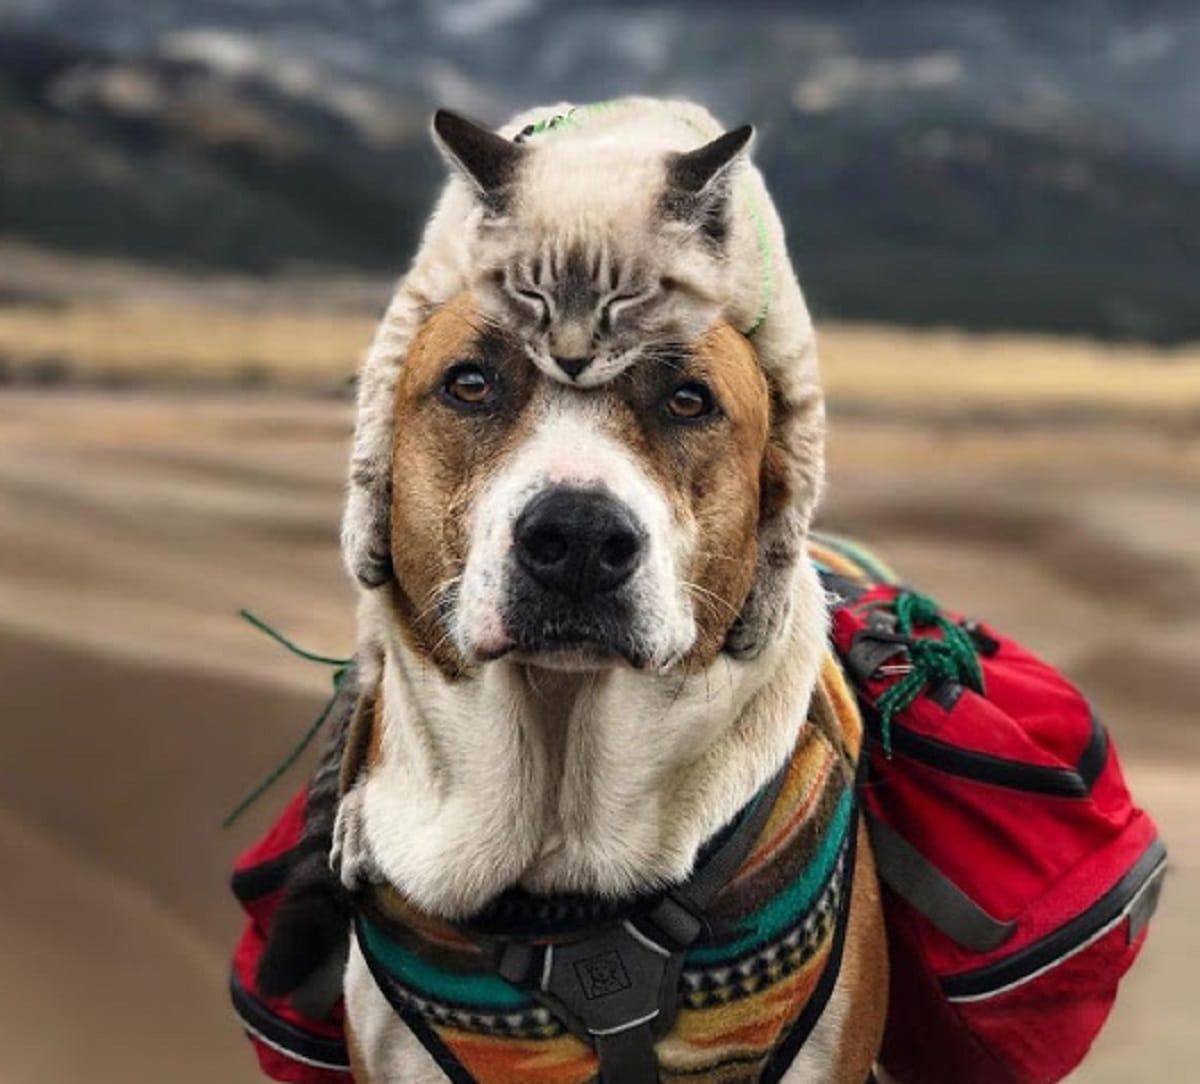 hiking buddies for life